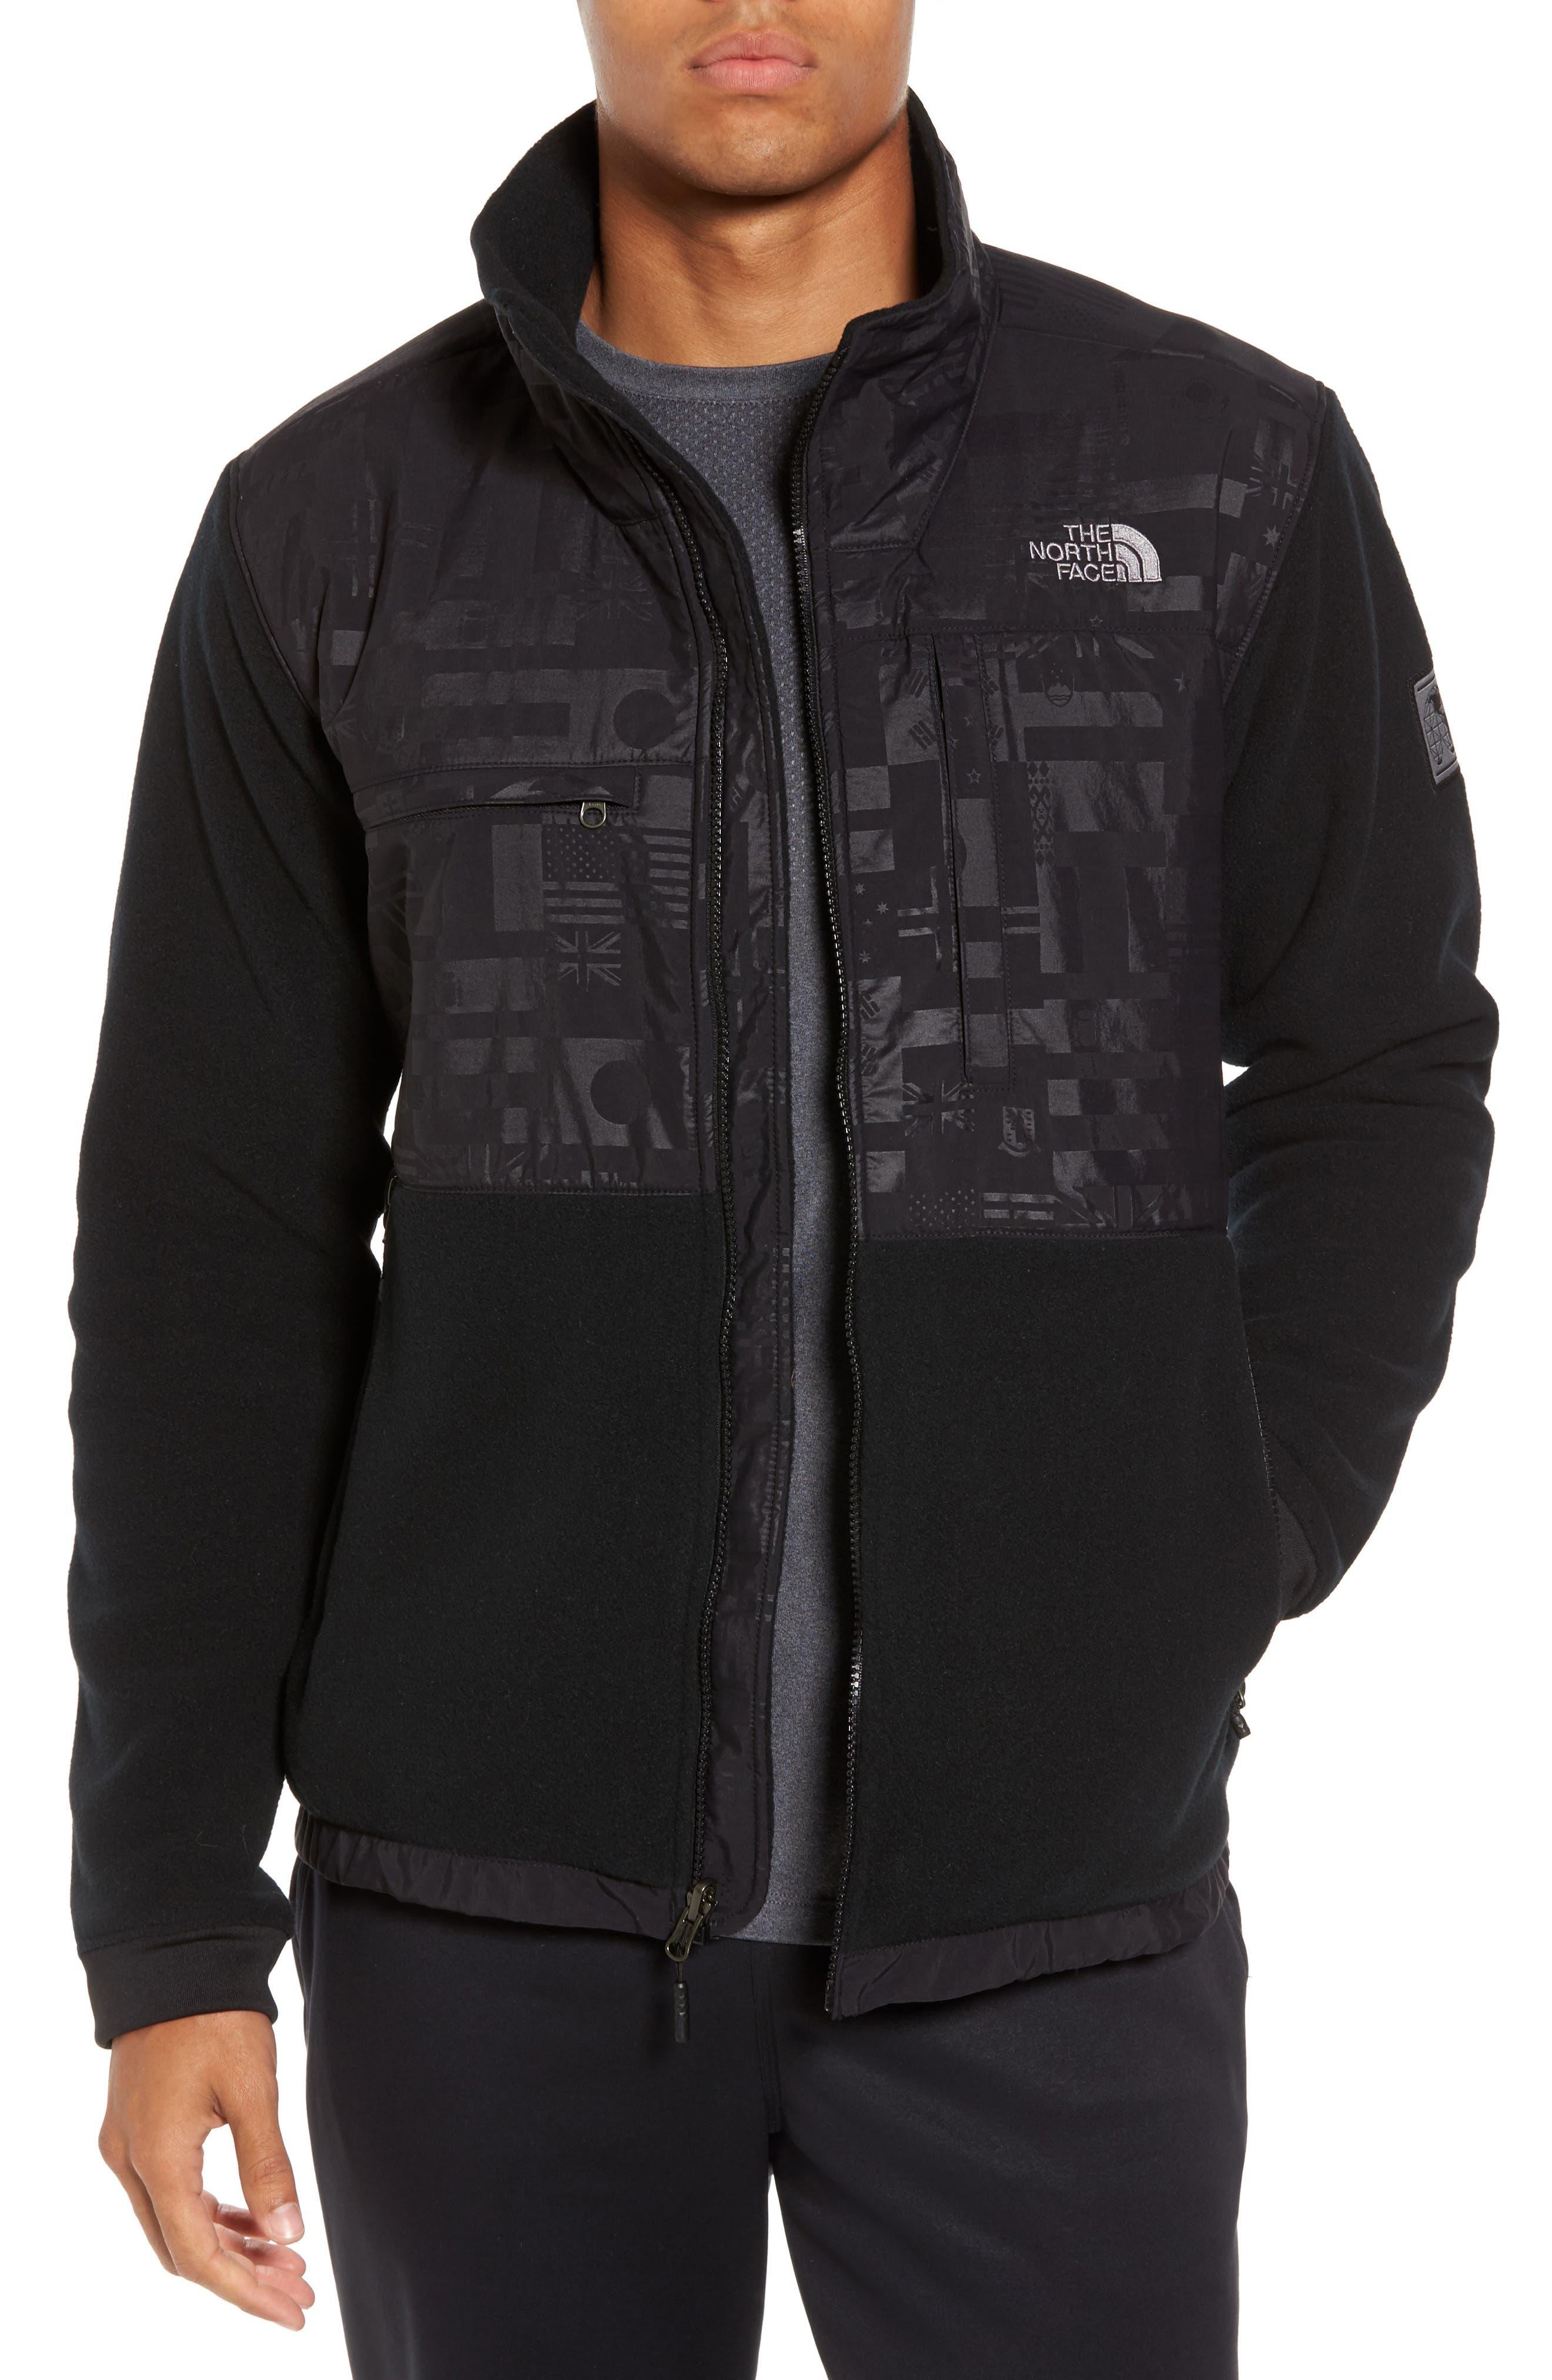 Denali 2 Polartec<sup>®</sup> Fleece Hoodie,                         Main,                         color, Black